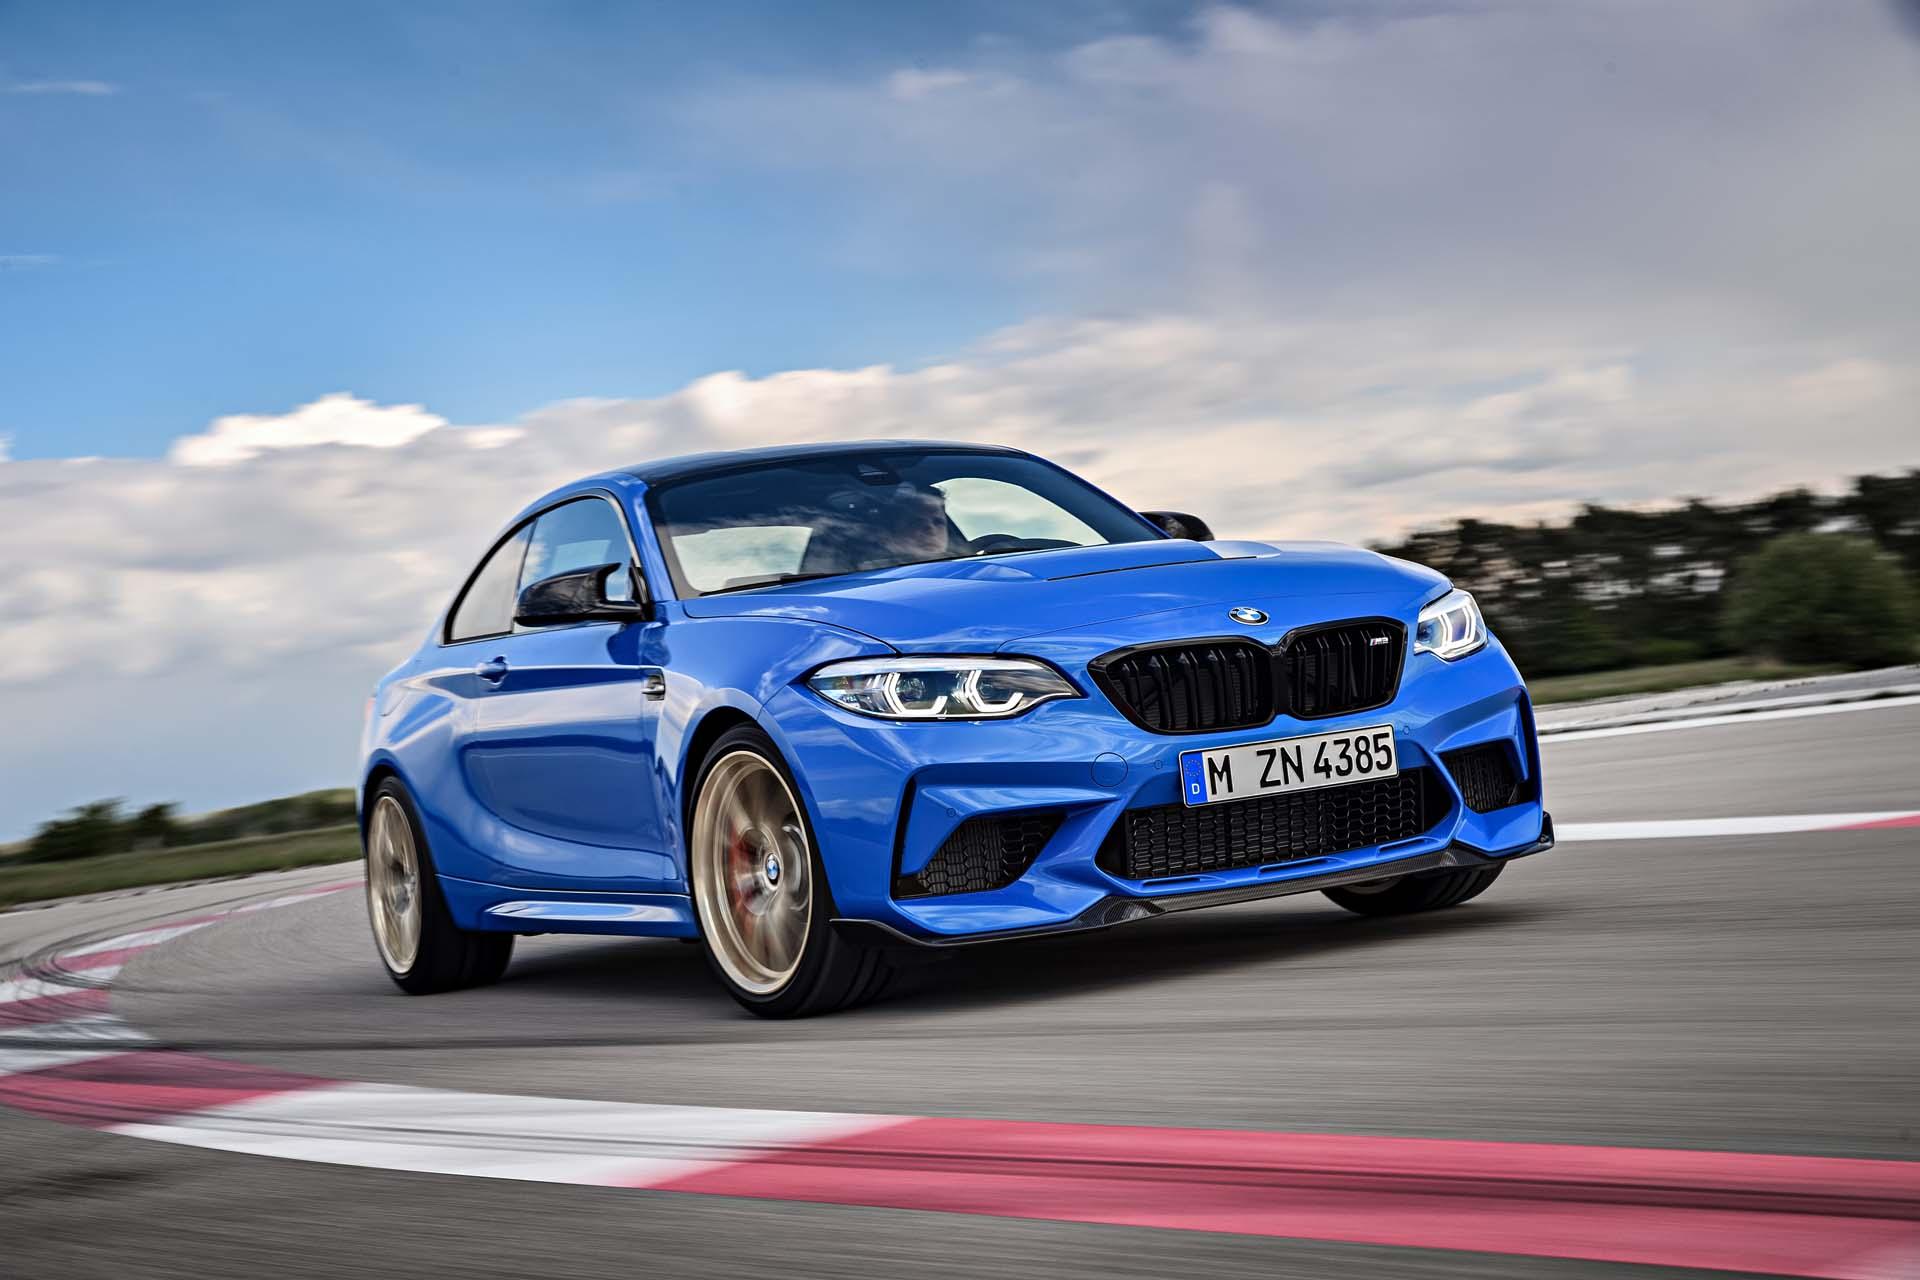 2016 - [BMW] M2 [F87] - Page 11 2020-bmw-2-series_100722769_h